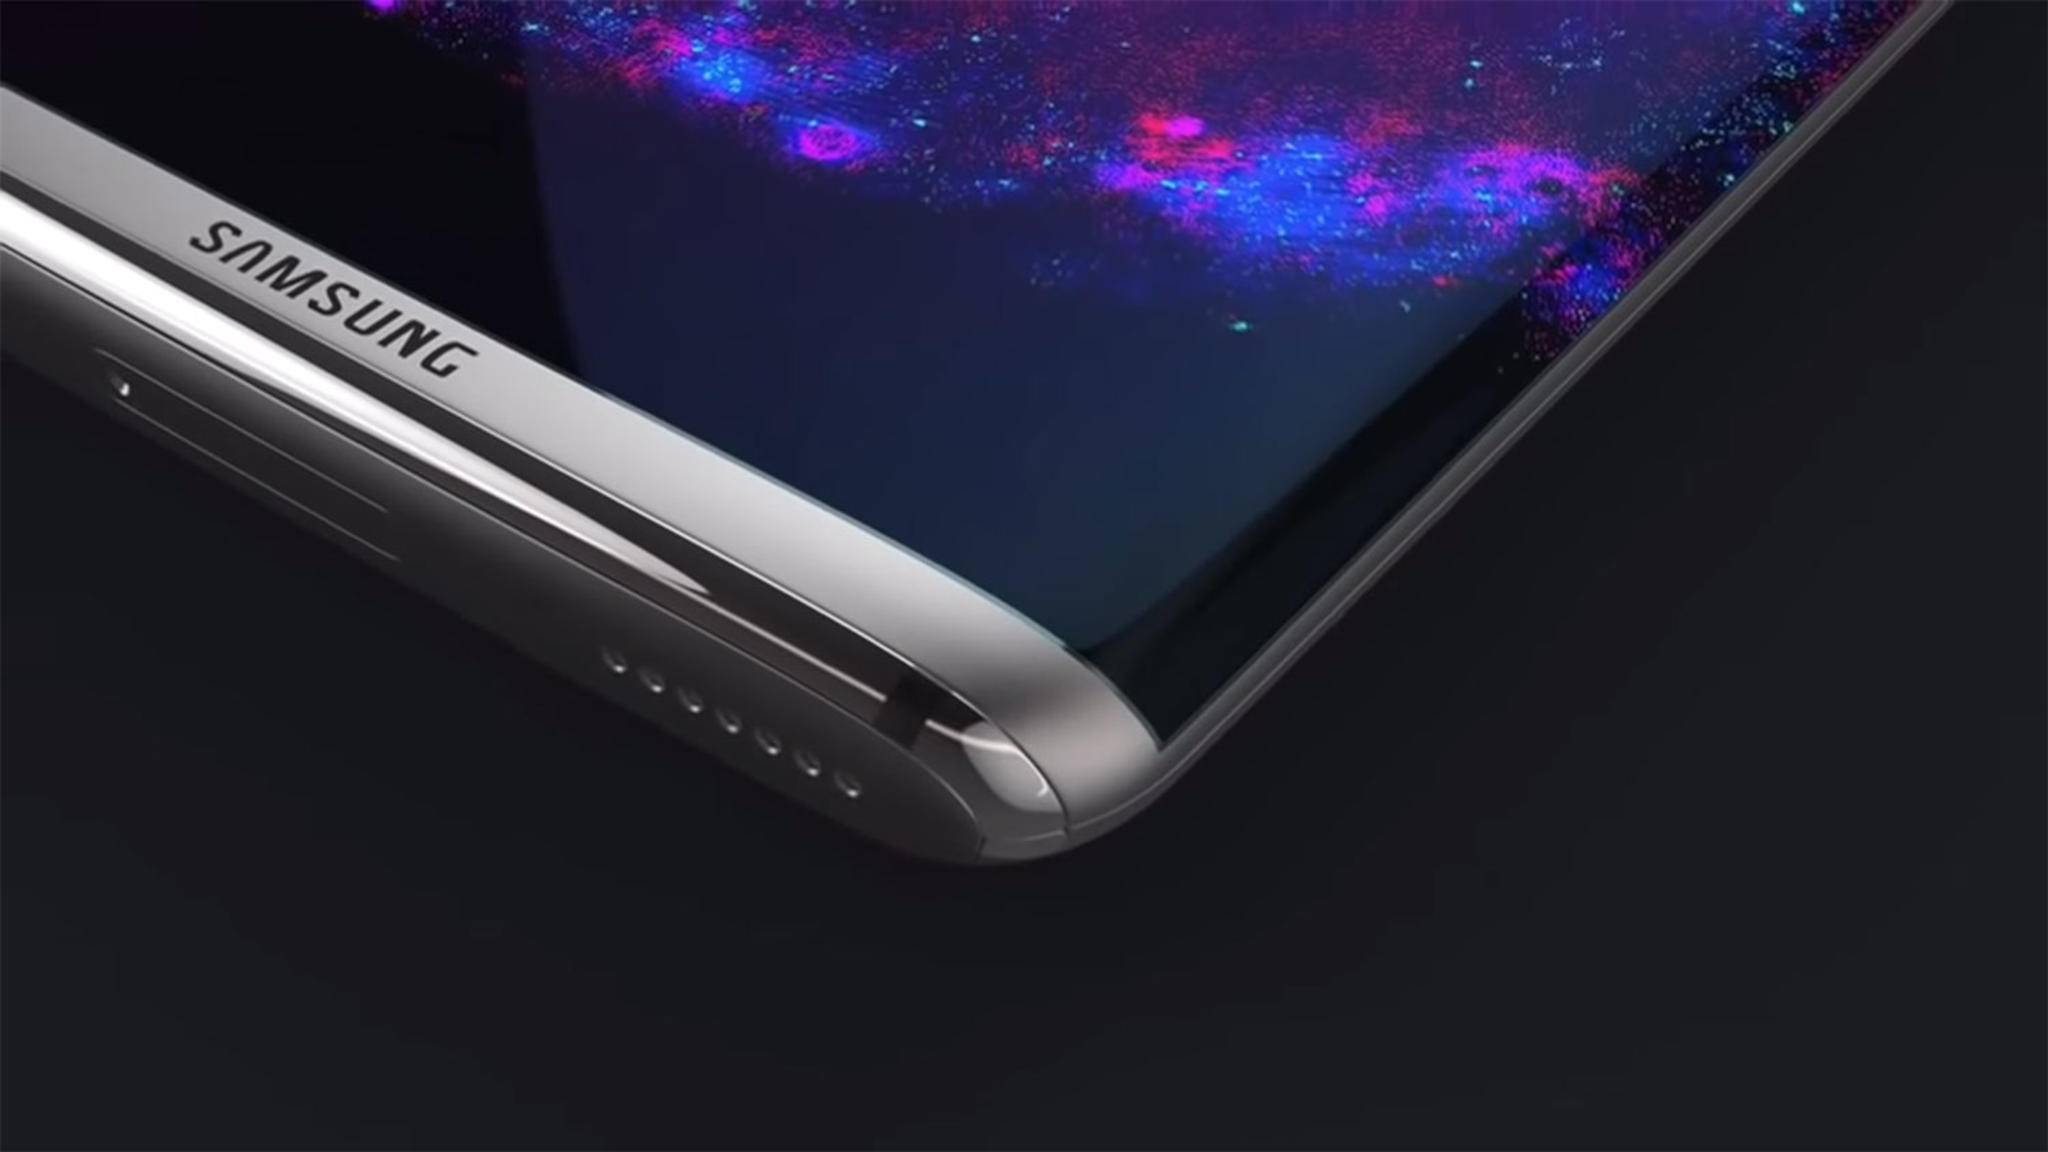 Das Galaxy S8 soll ein nahezu rahmenloses Display bekommen.